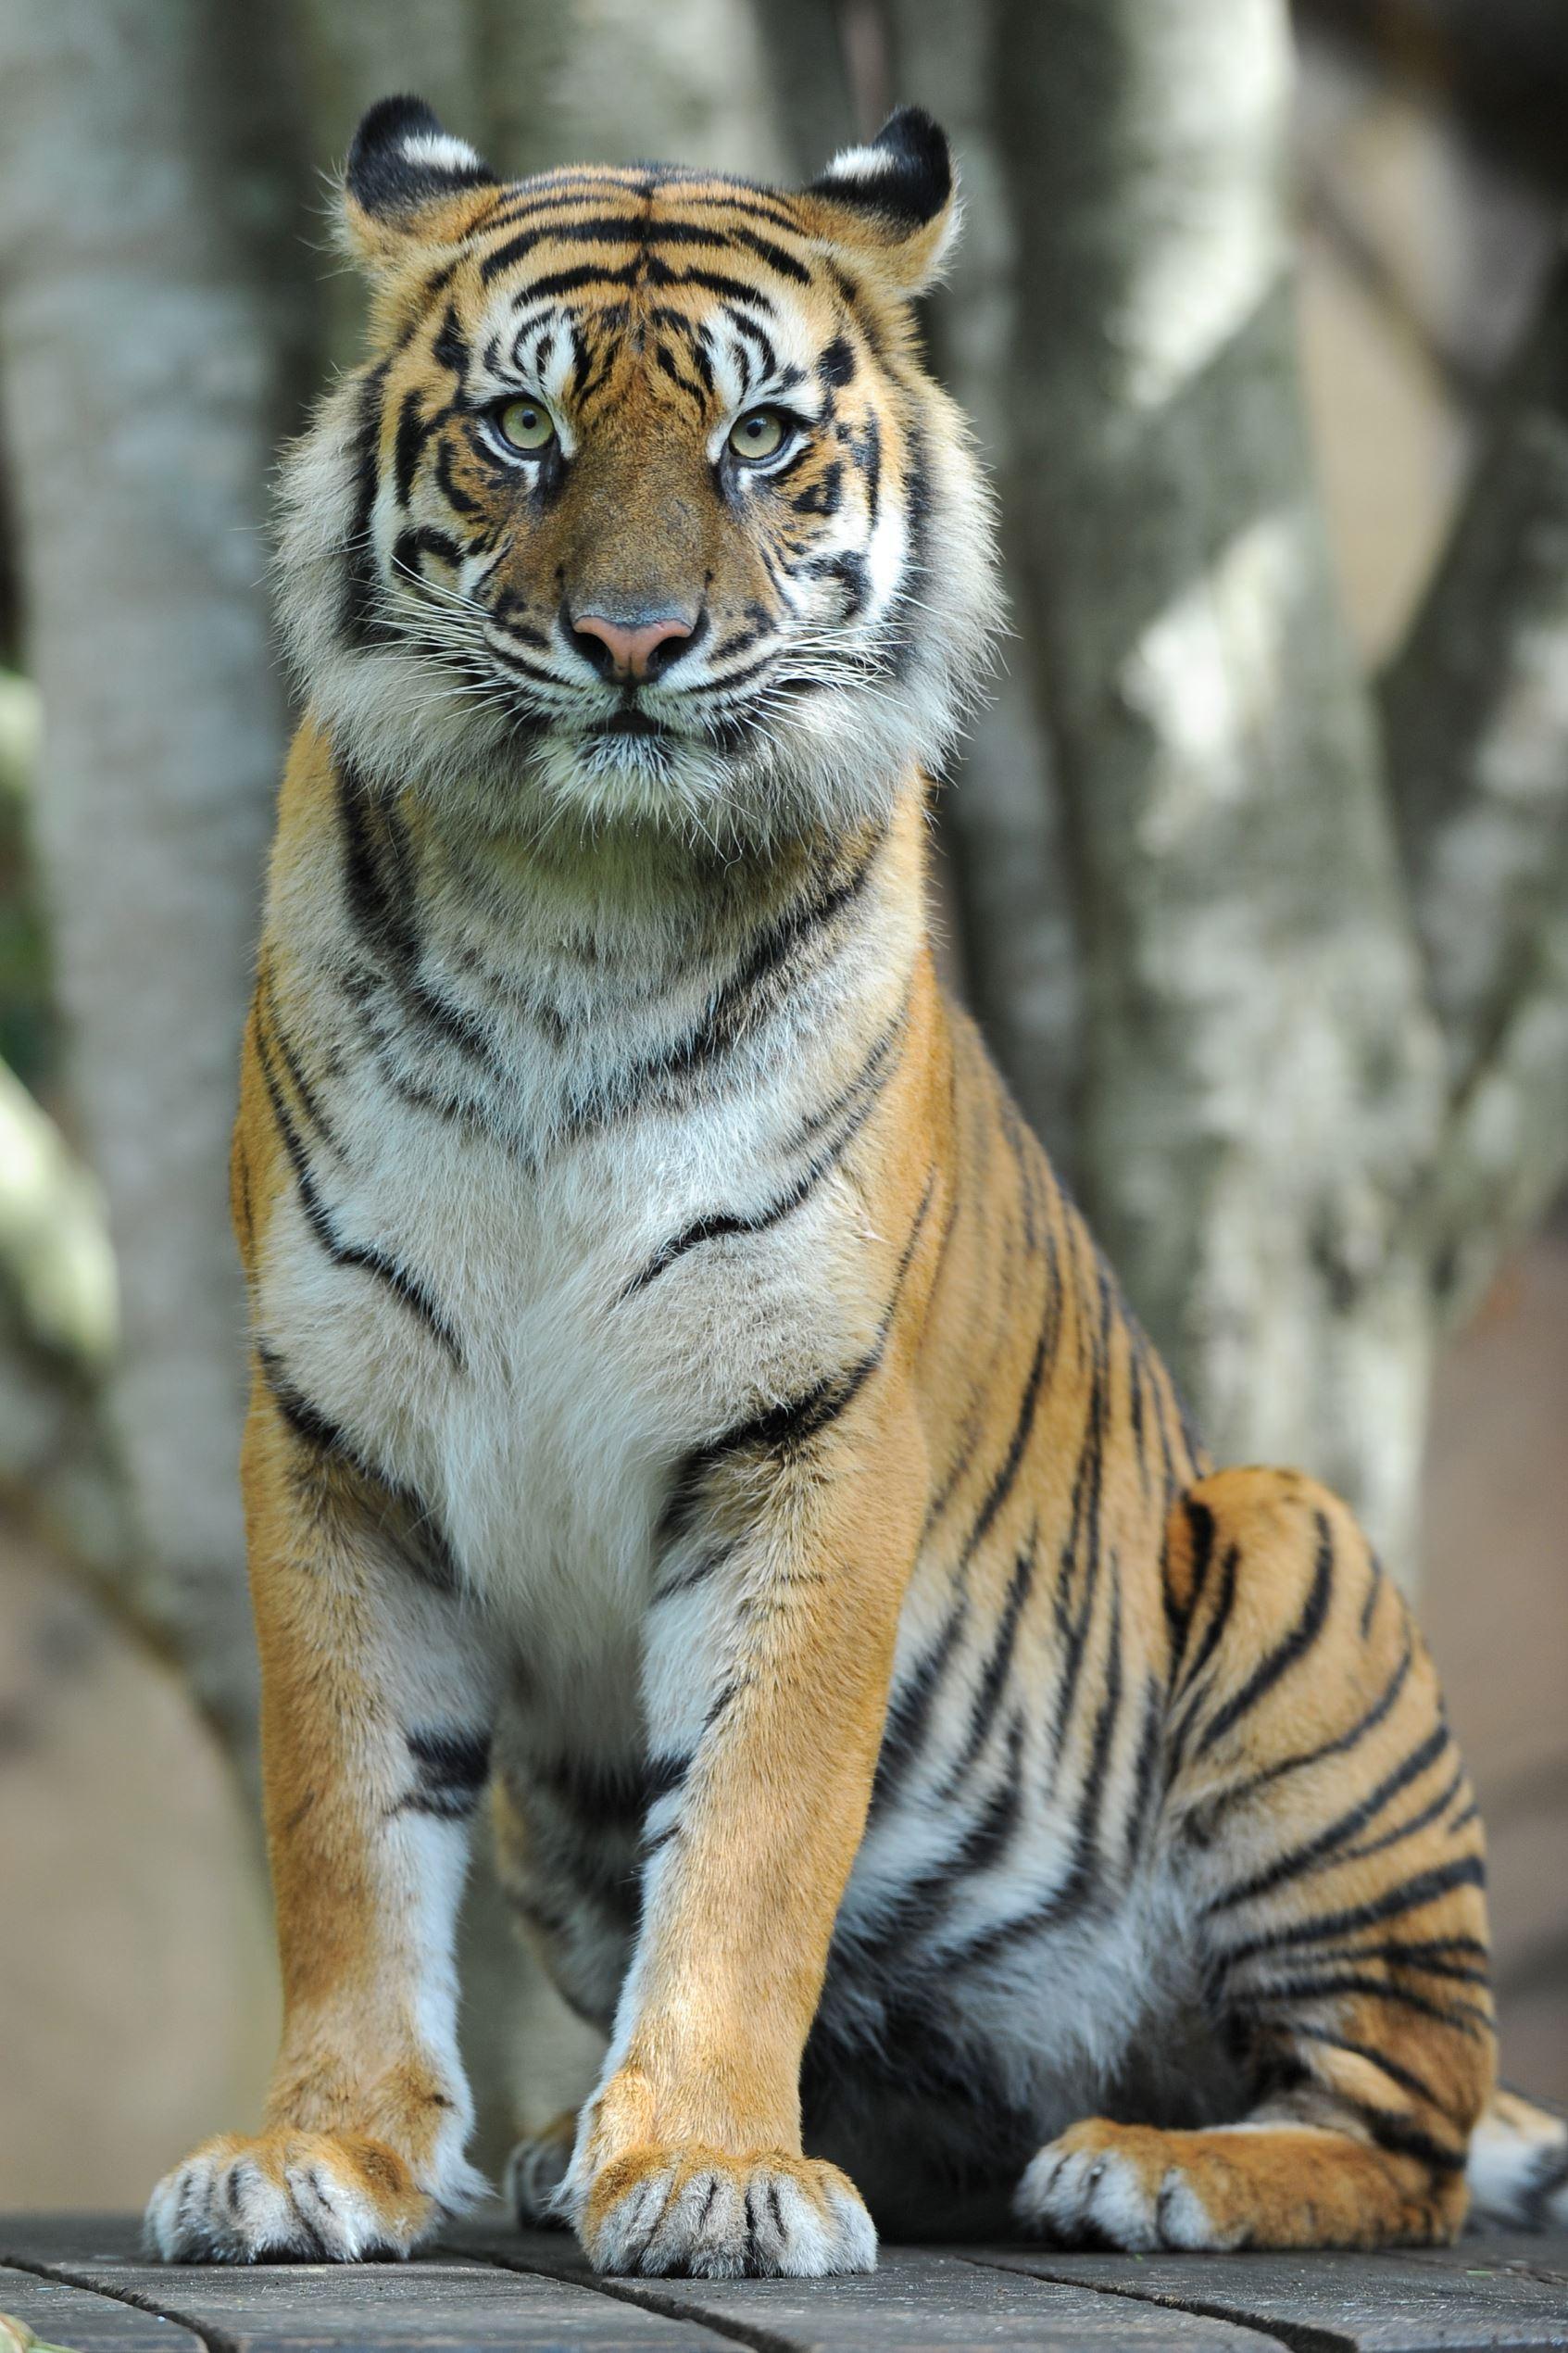 Tigers mor ar rasande